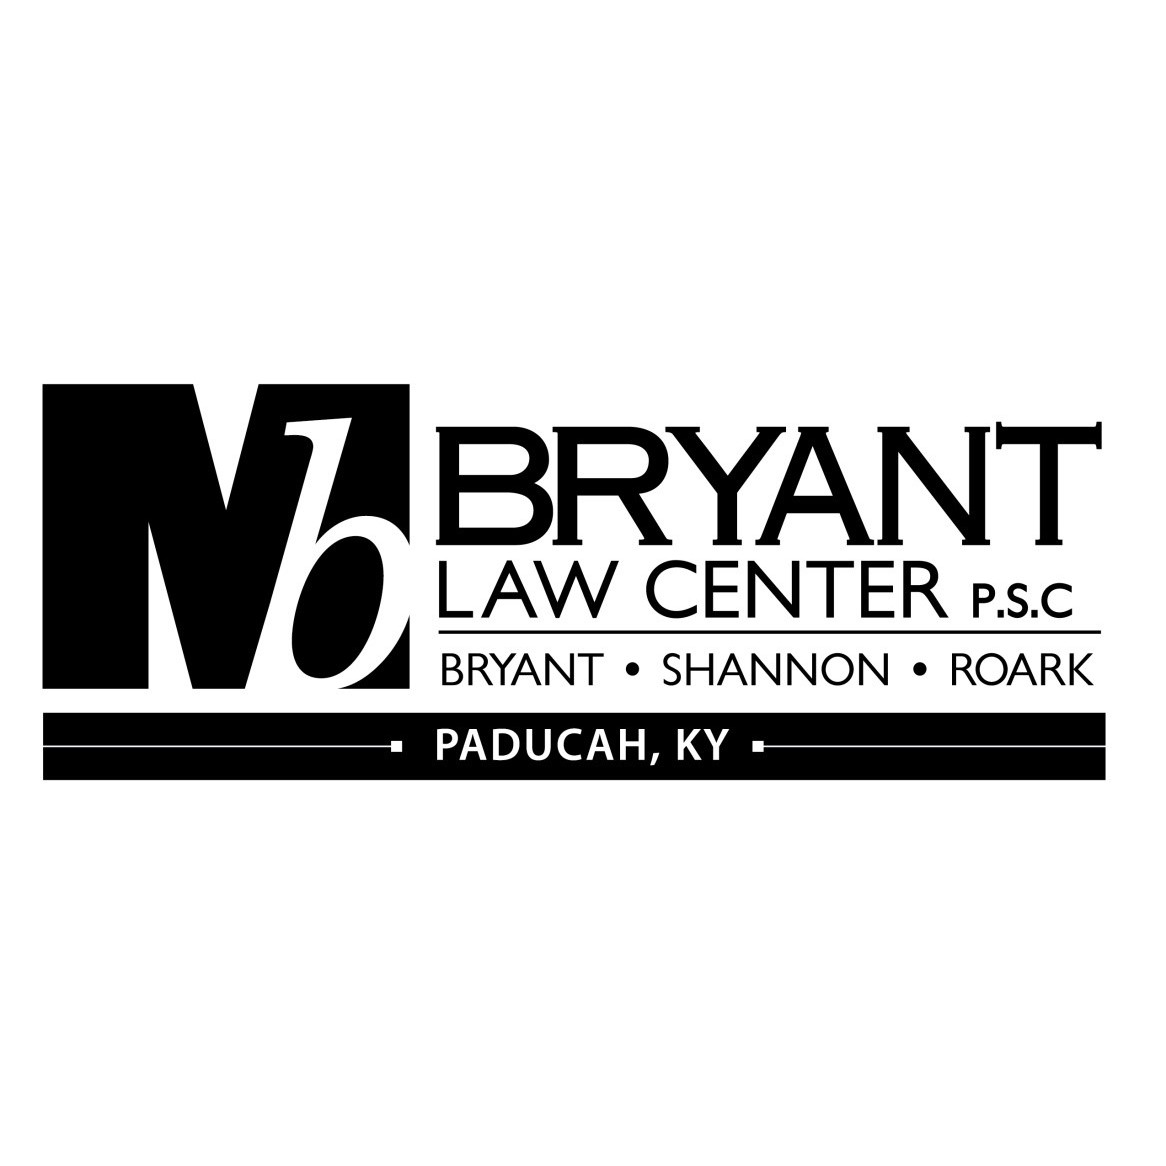 Bryant Law Center